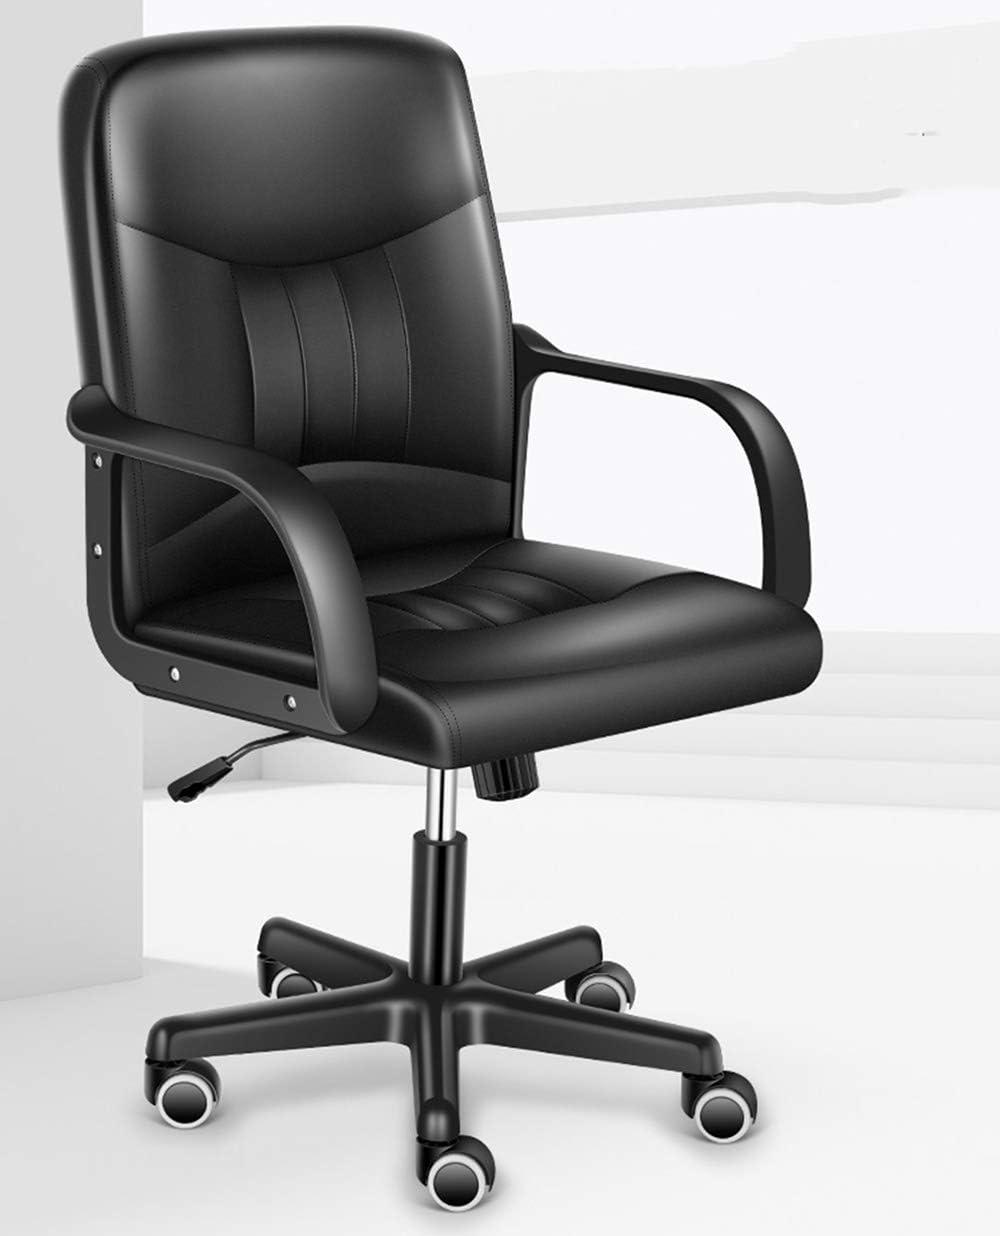 Amazon.com: Fubas- Home Office Chair, Skin-Friendly Casual Boss